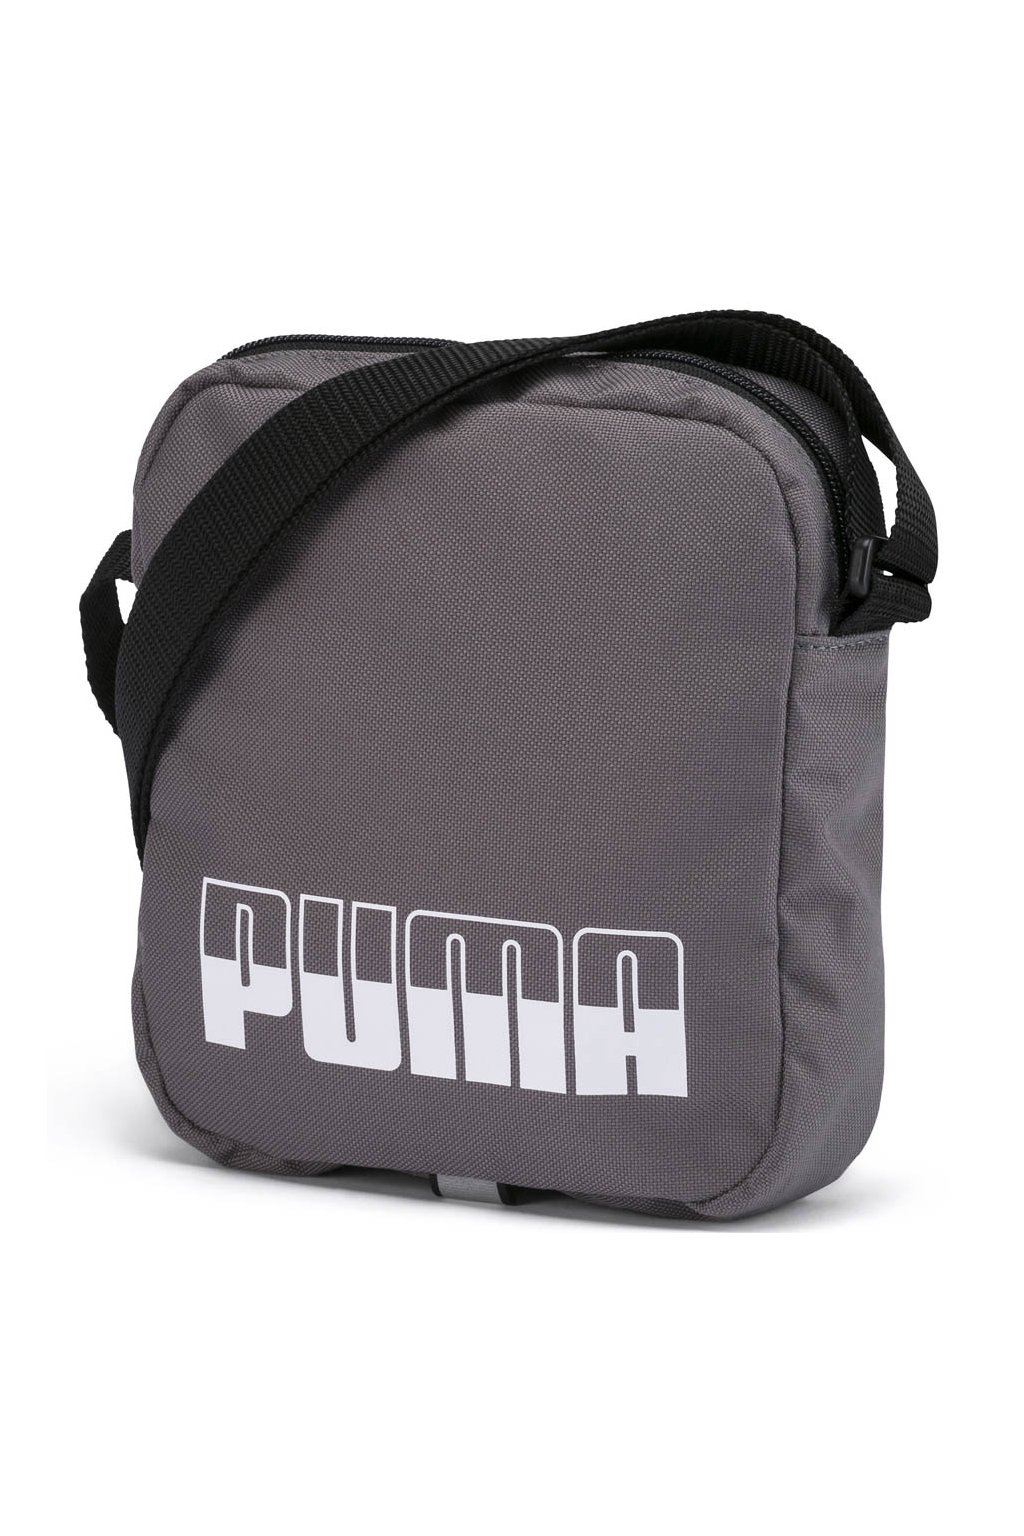 Taška Puma Plus II šedá 076061 06